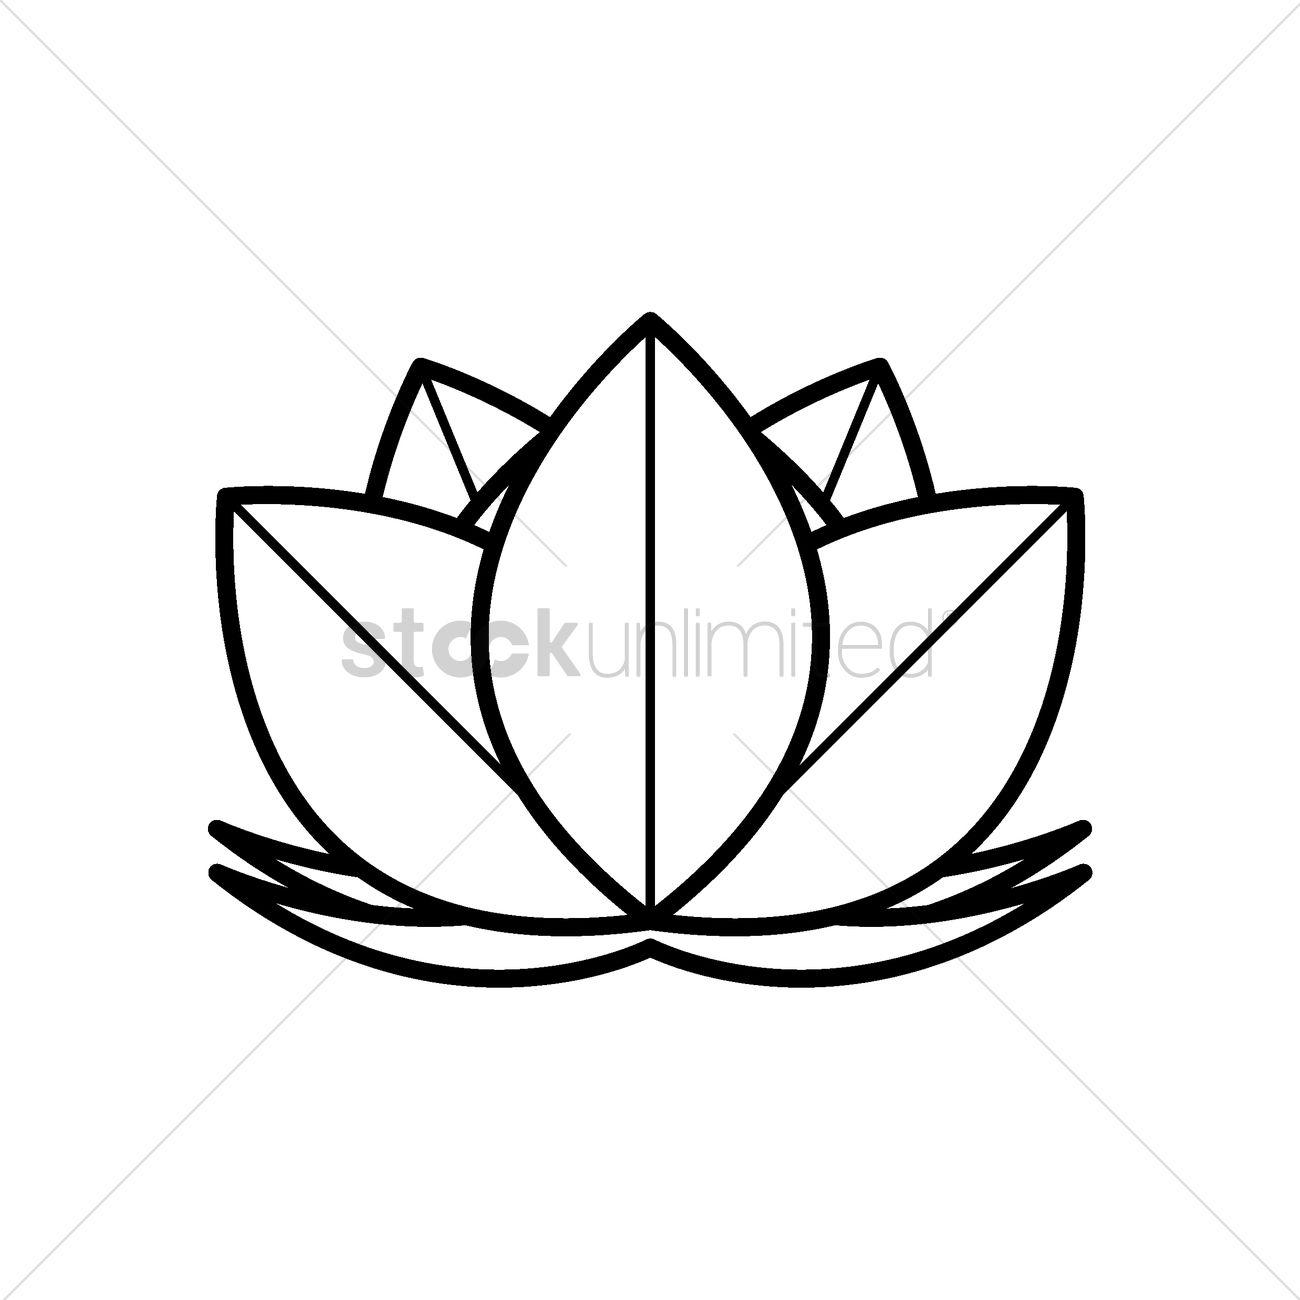 Lotus Flower Vector Image 1968406 Stockunlimited